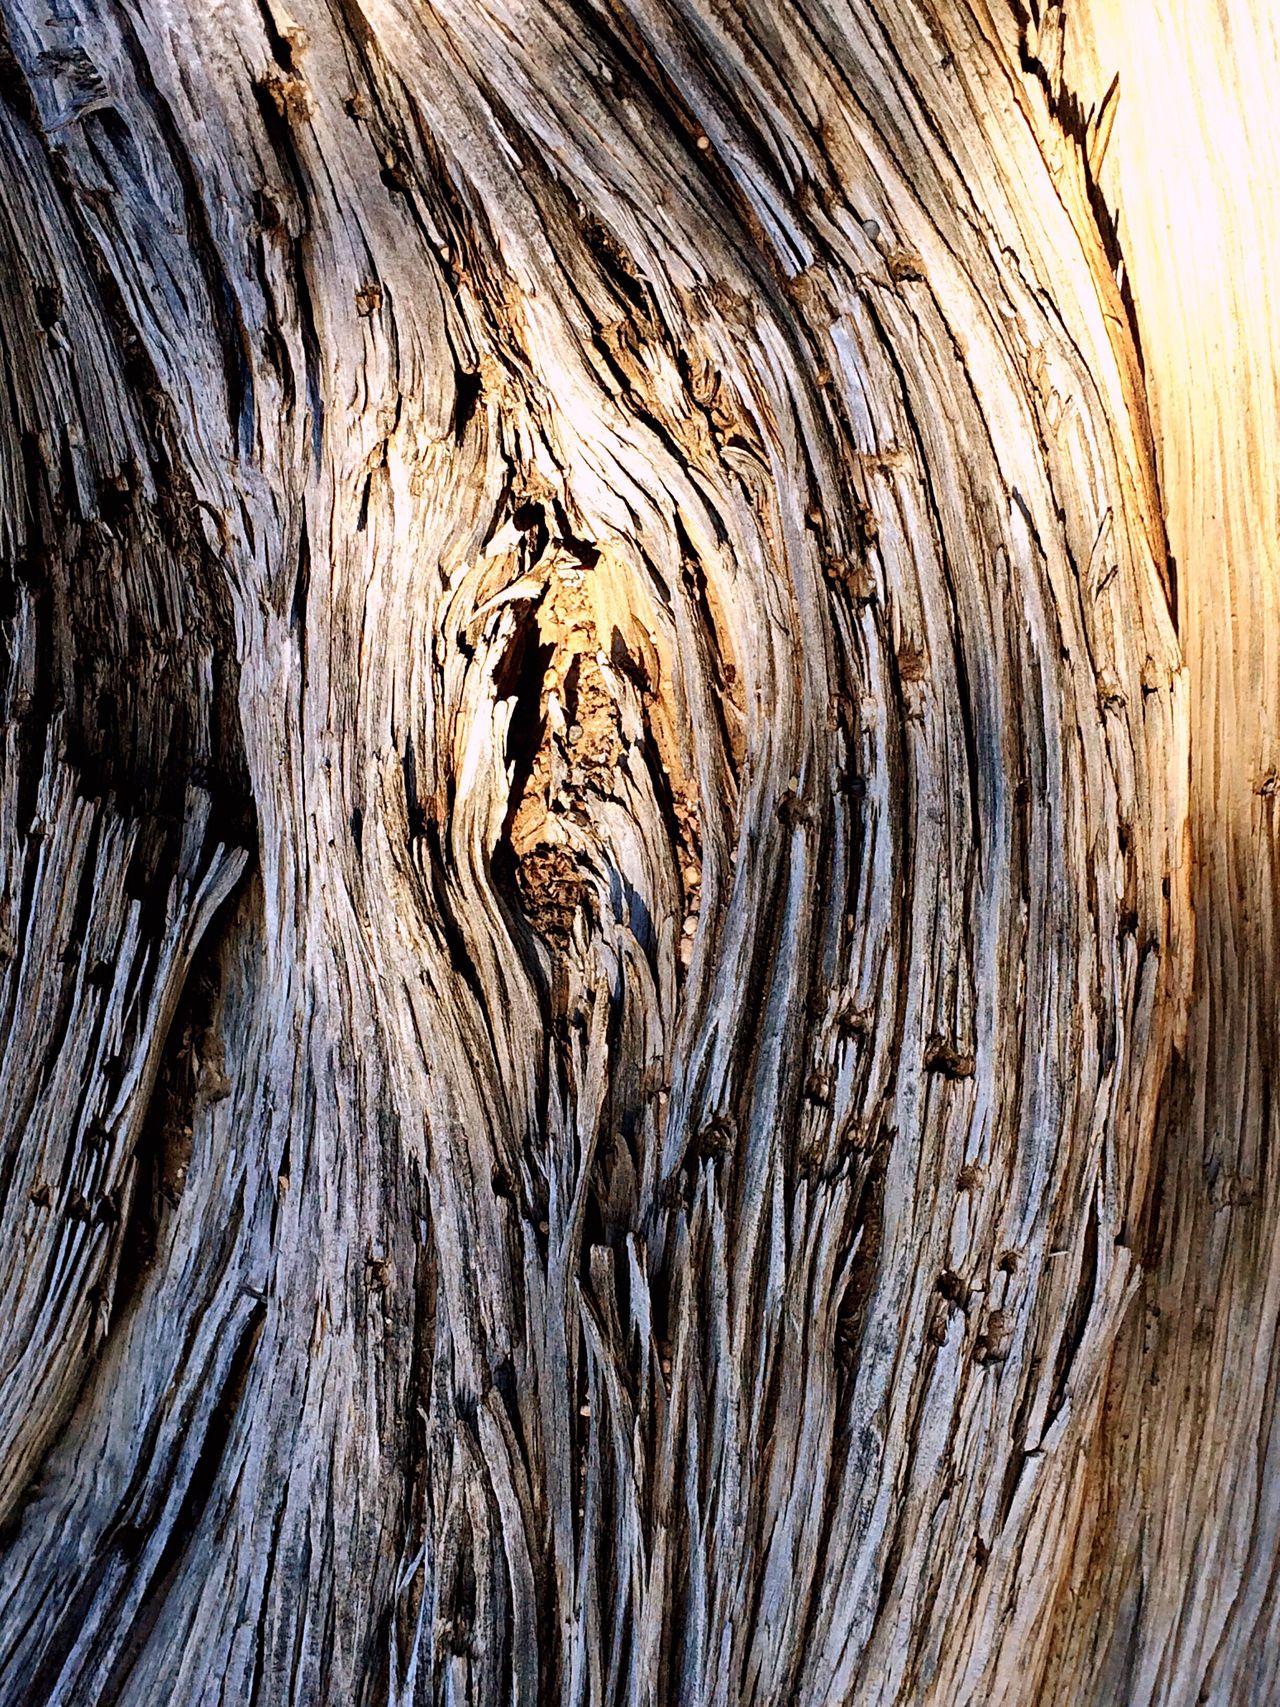 Wood Wooden Texture Wood Pattern Bark Bark Texture Bark Of A Tree Intricate Details Grain Of Wood Macro Photography Macro Beauty Desert Desert Beauty Desert Life Desert Plants Life Through A Lens Golden Light Love Of Nature EyeEm Nature Lover Light And Shadow Light Shadow Tree Tree Trunk Juniper Juniper Trees